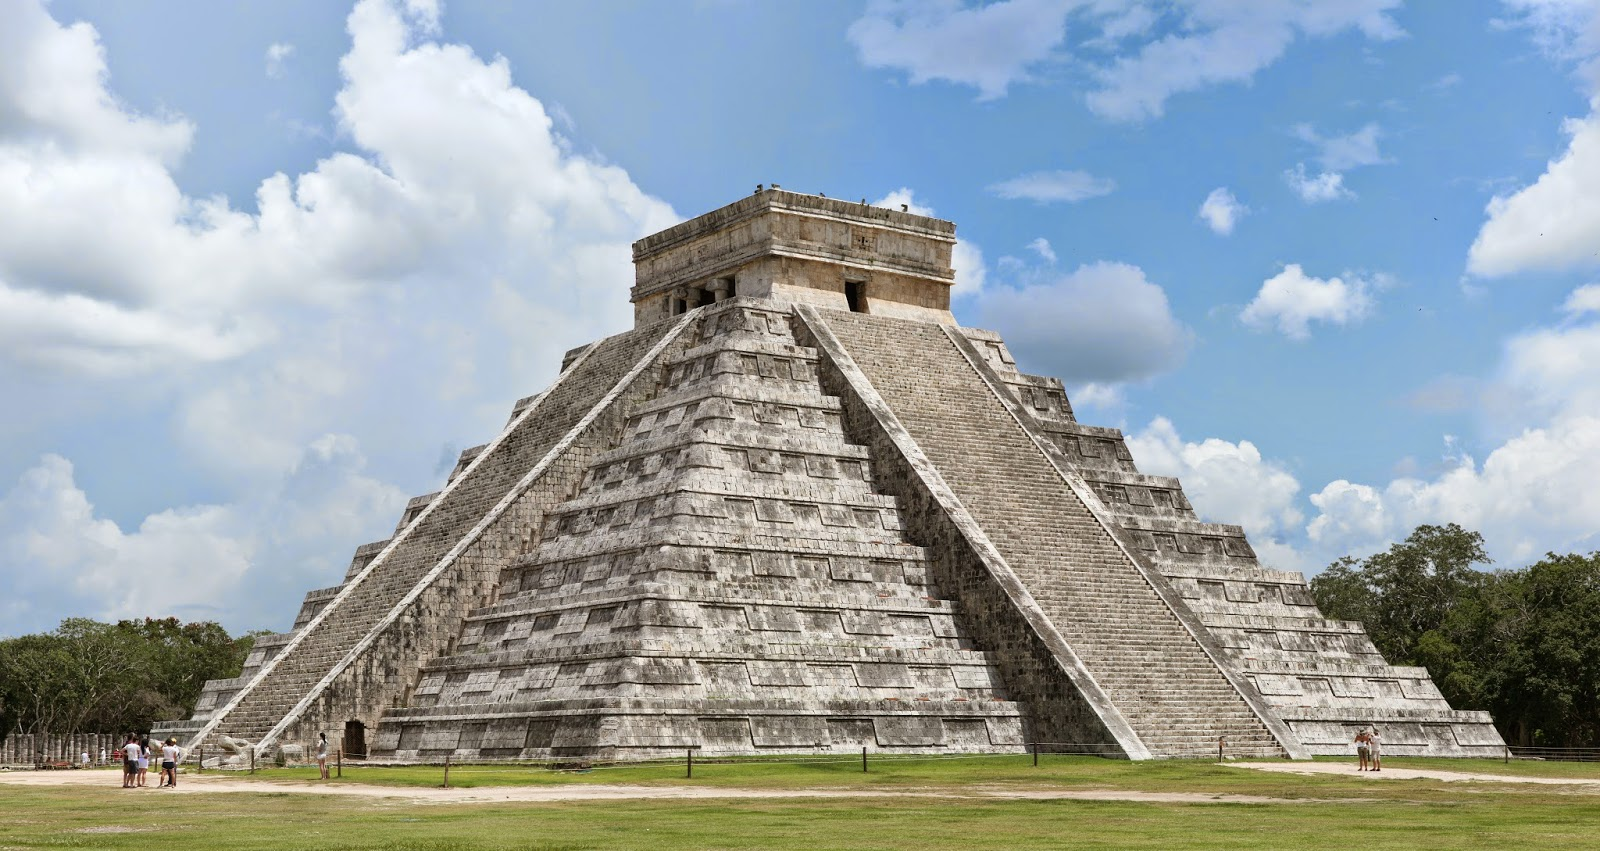 7 Keajaiban Dunia Terbaru Dan Lama Beserta Gambar